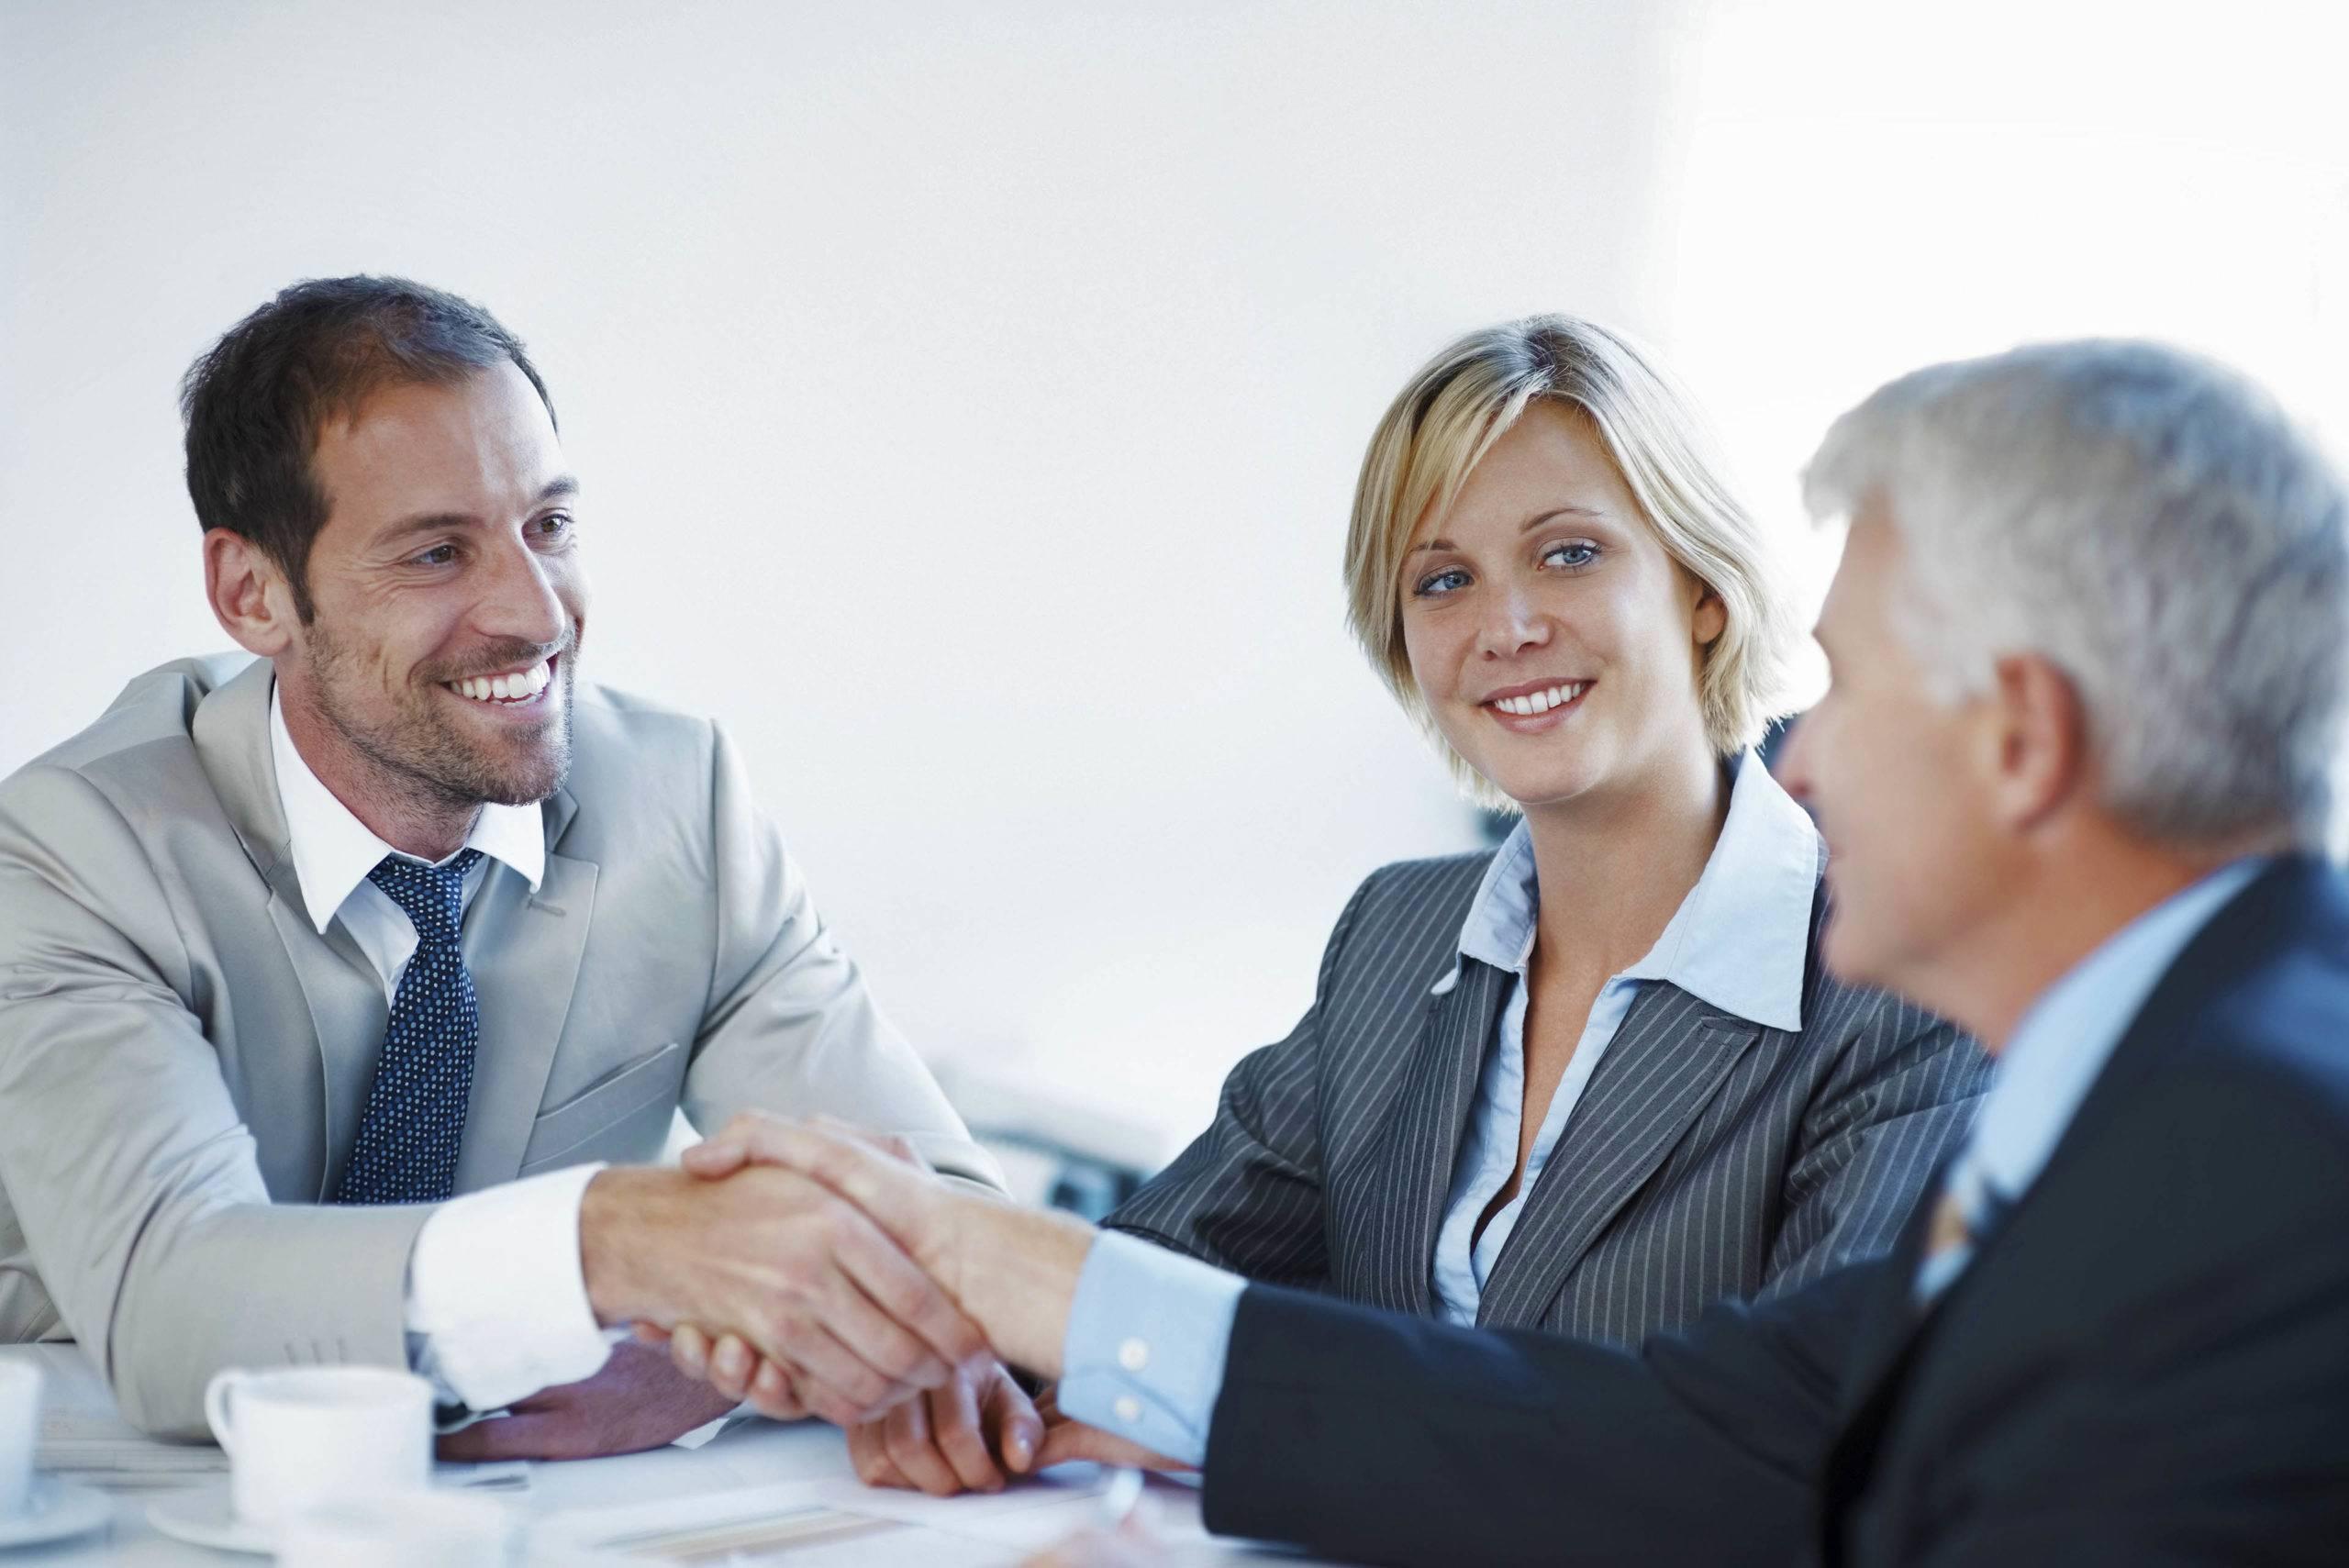 business-loans-and-finance-business-loans-nab-bank-guarantee